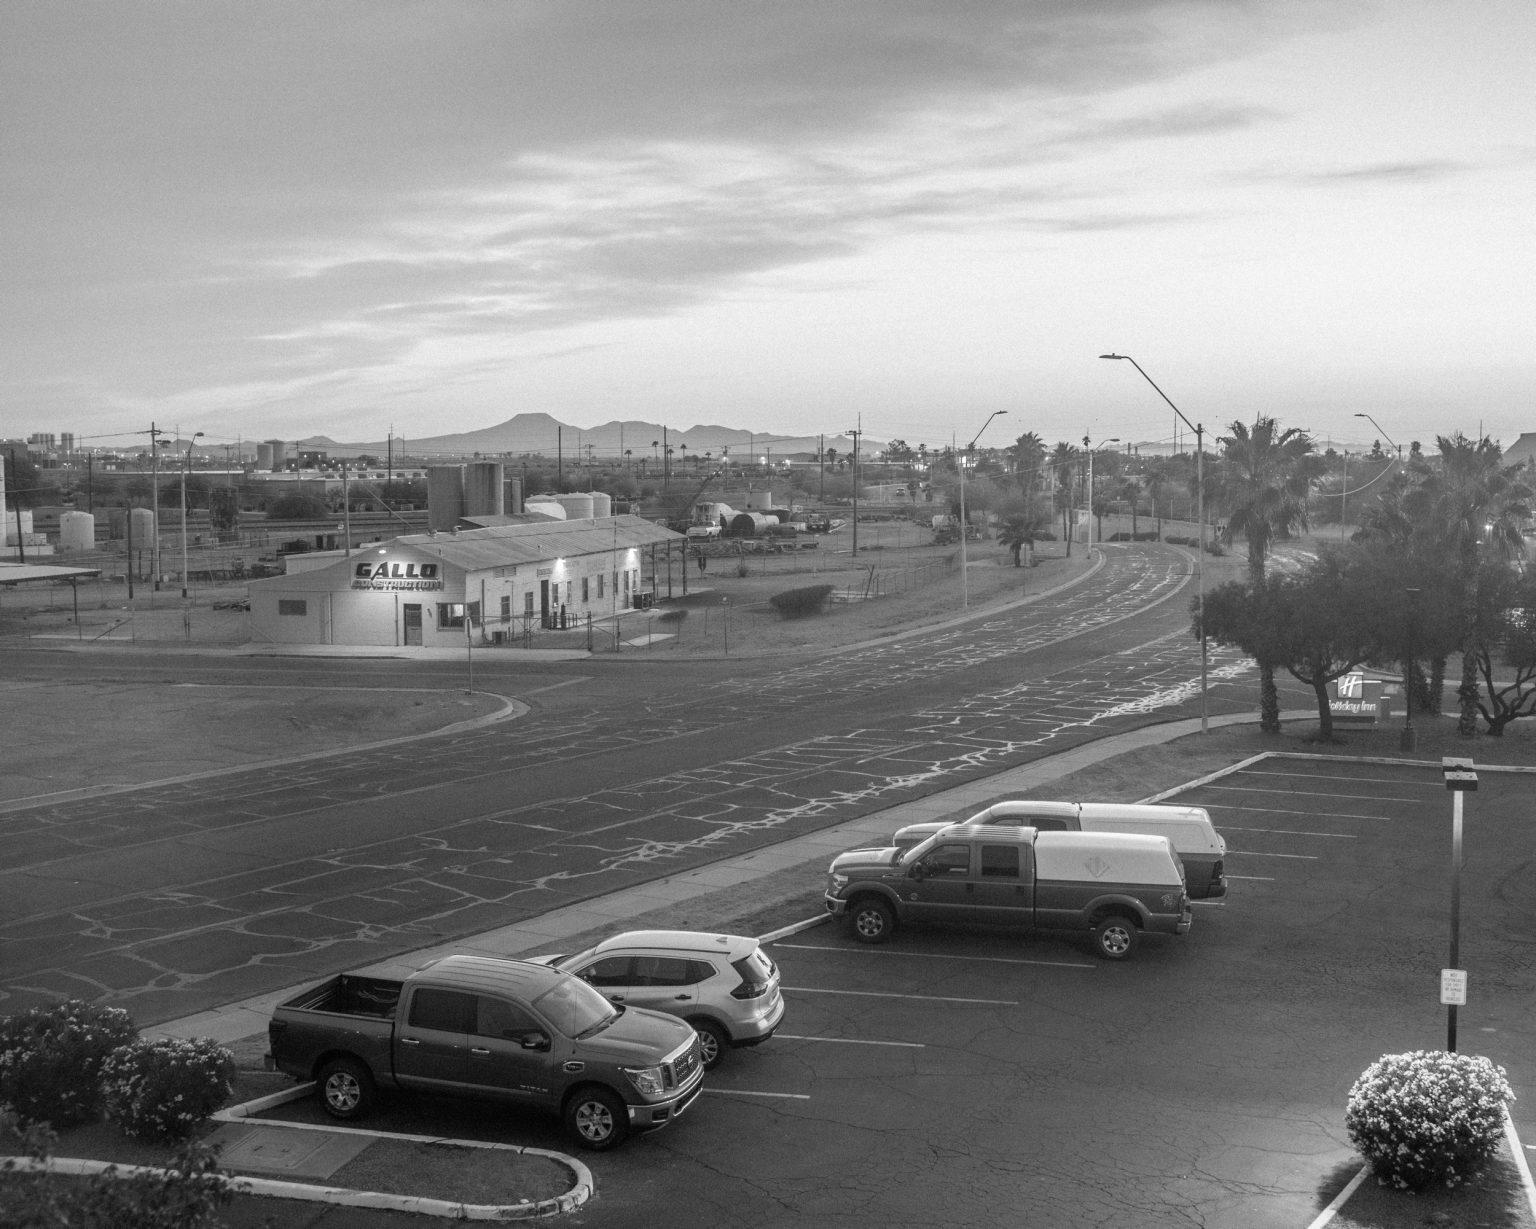 Holiday Inn view on Gallo's Construction.  Casa Grande, Arizona, April 2017.